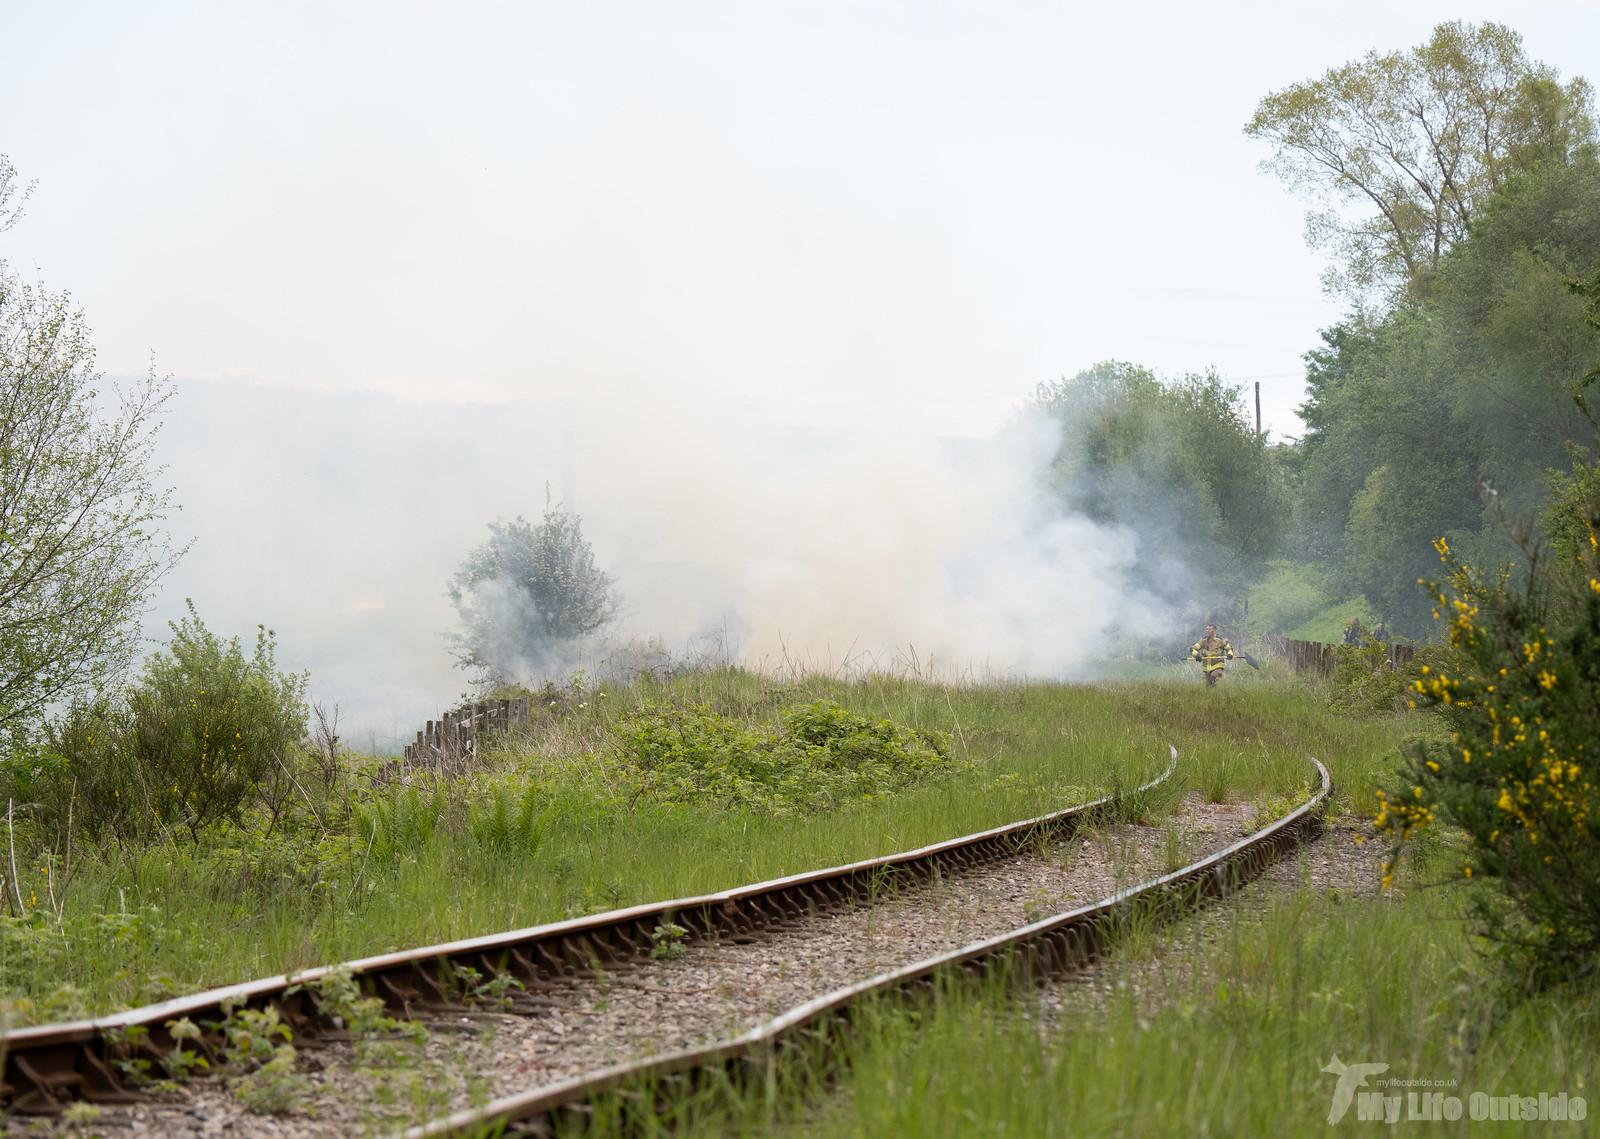 P6043050 - Pontypool and Blaenavon Railway